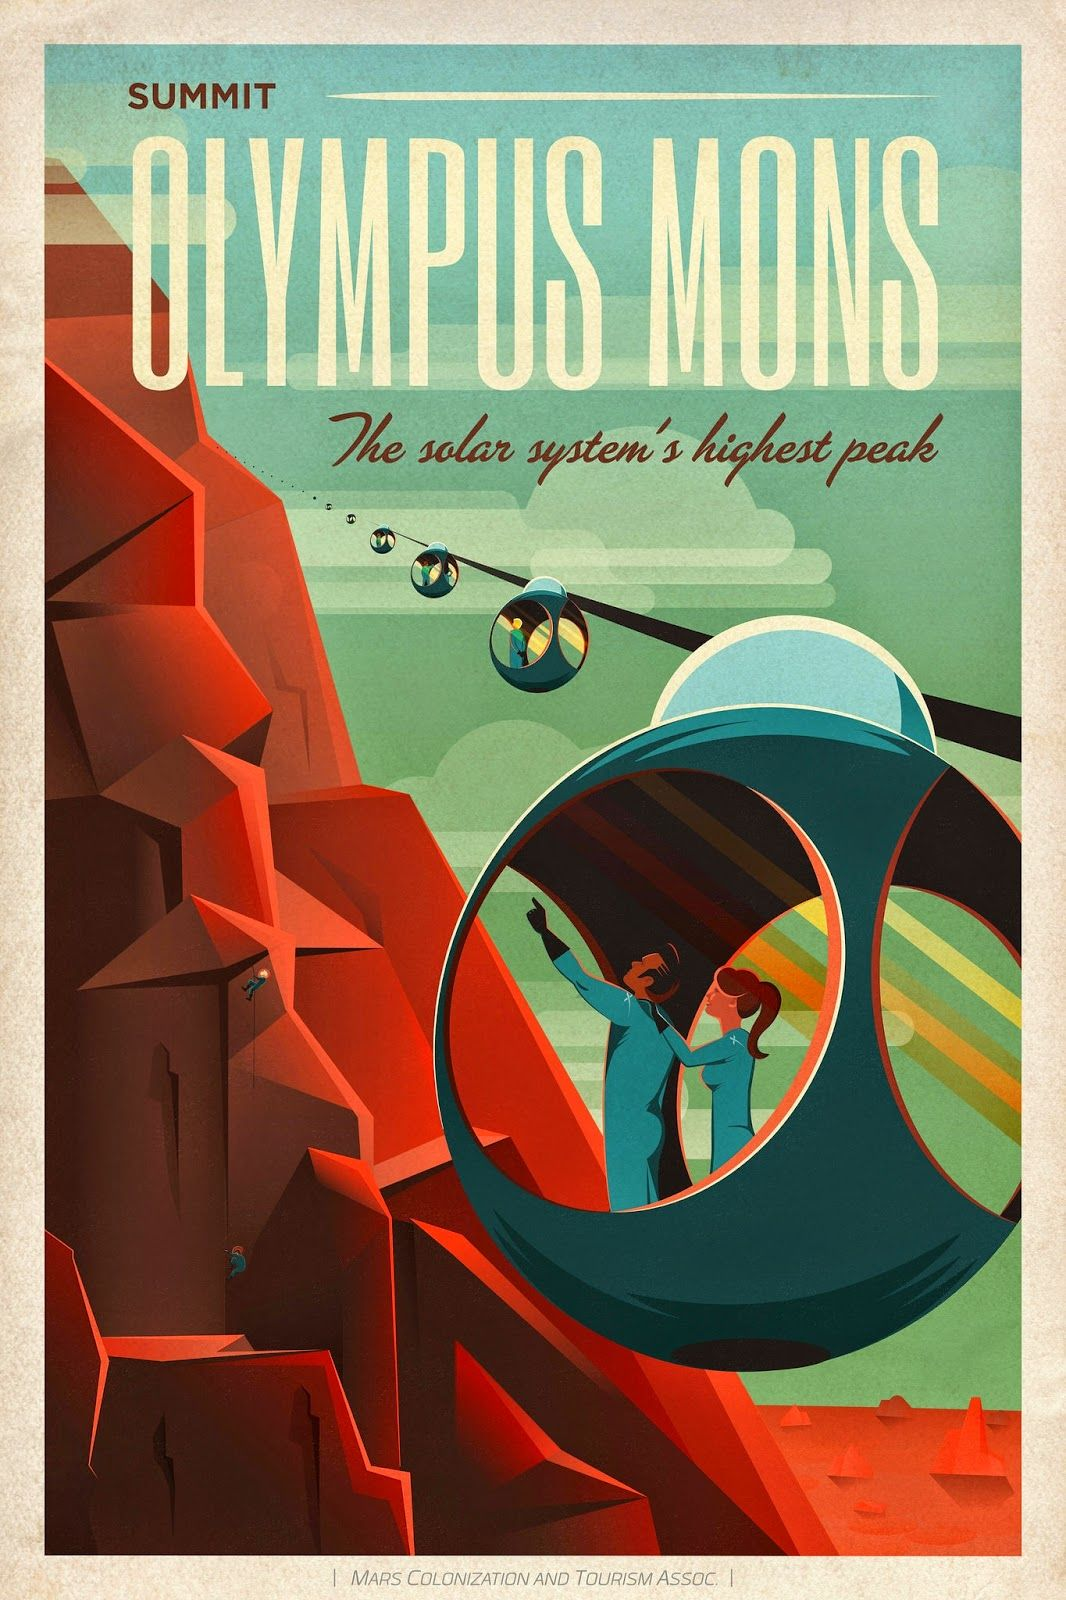 retro nasa posters cool